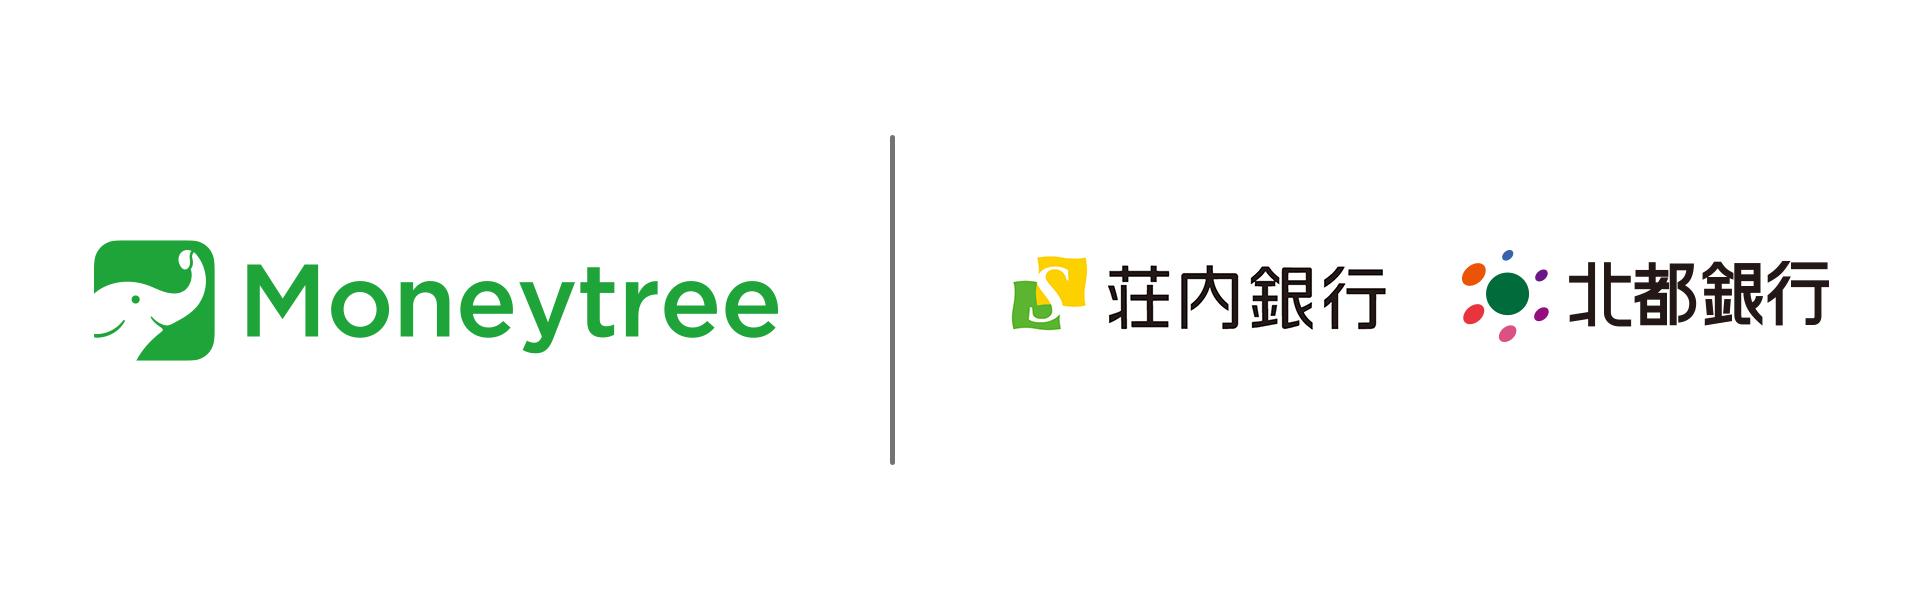 Moneytree-Partnership-Fidea2